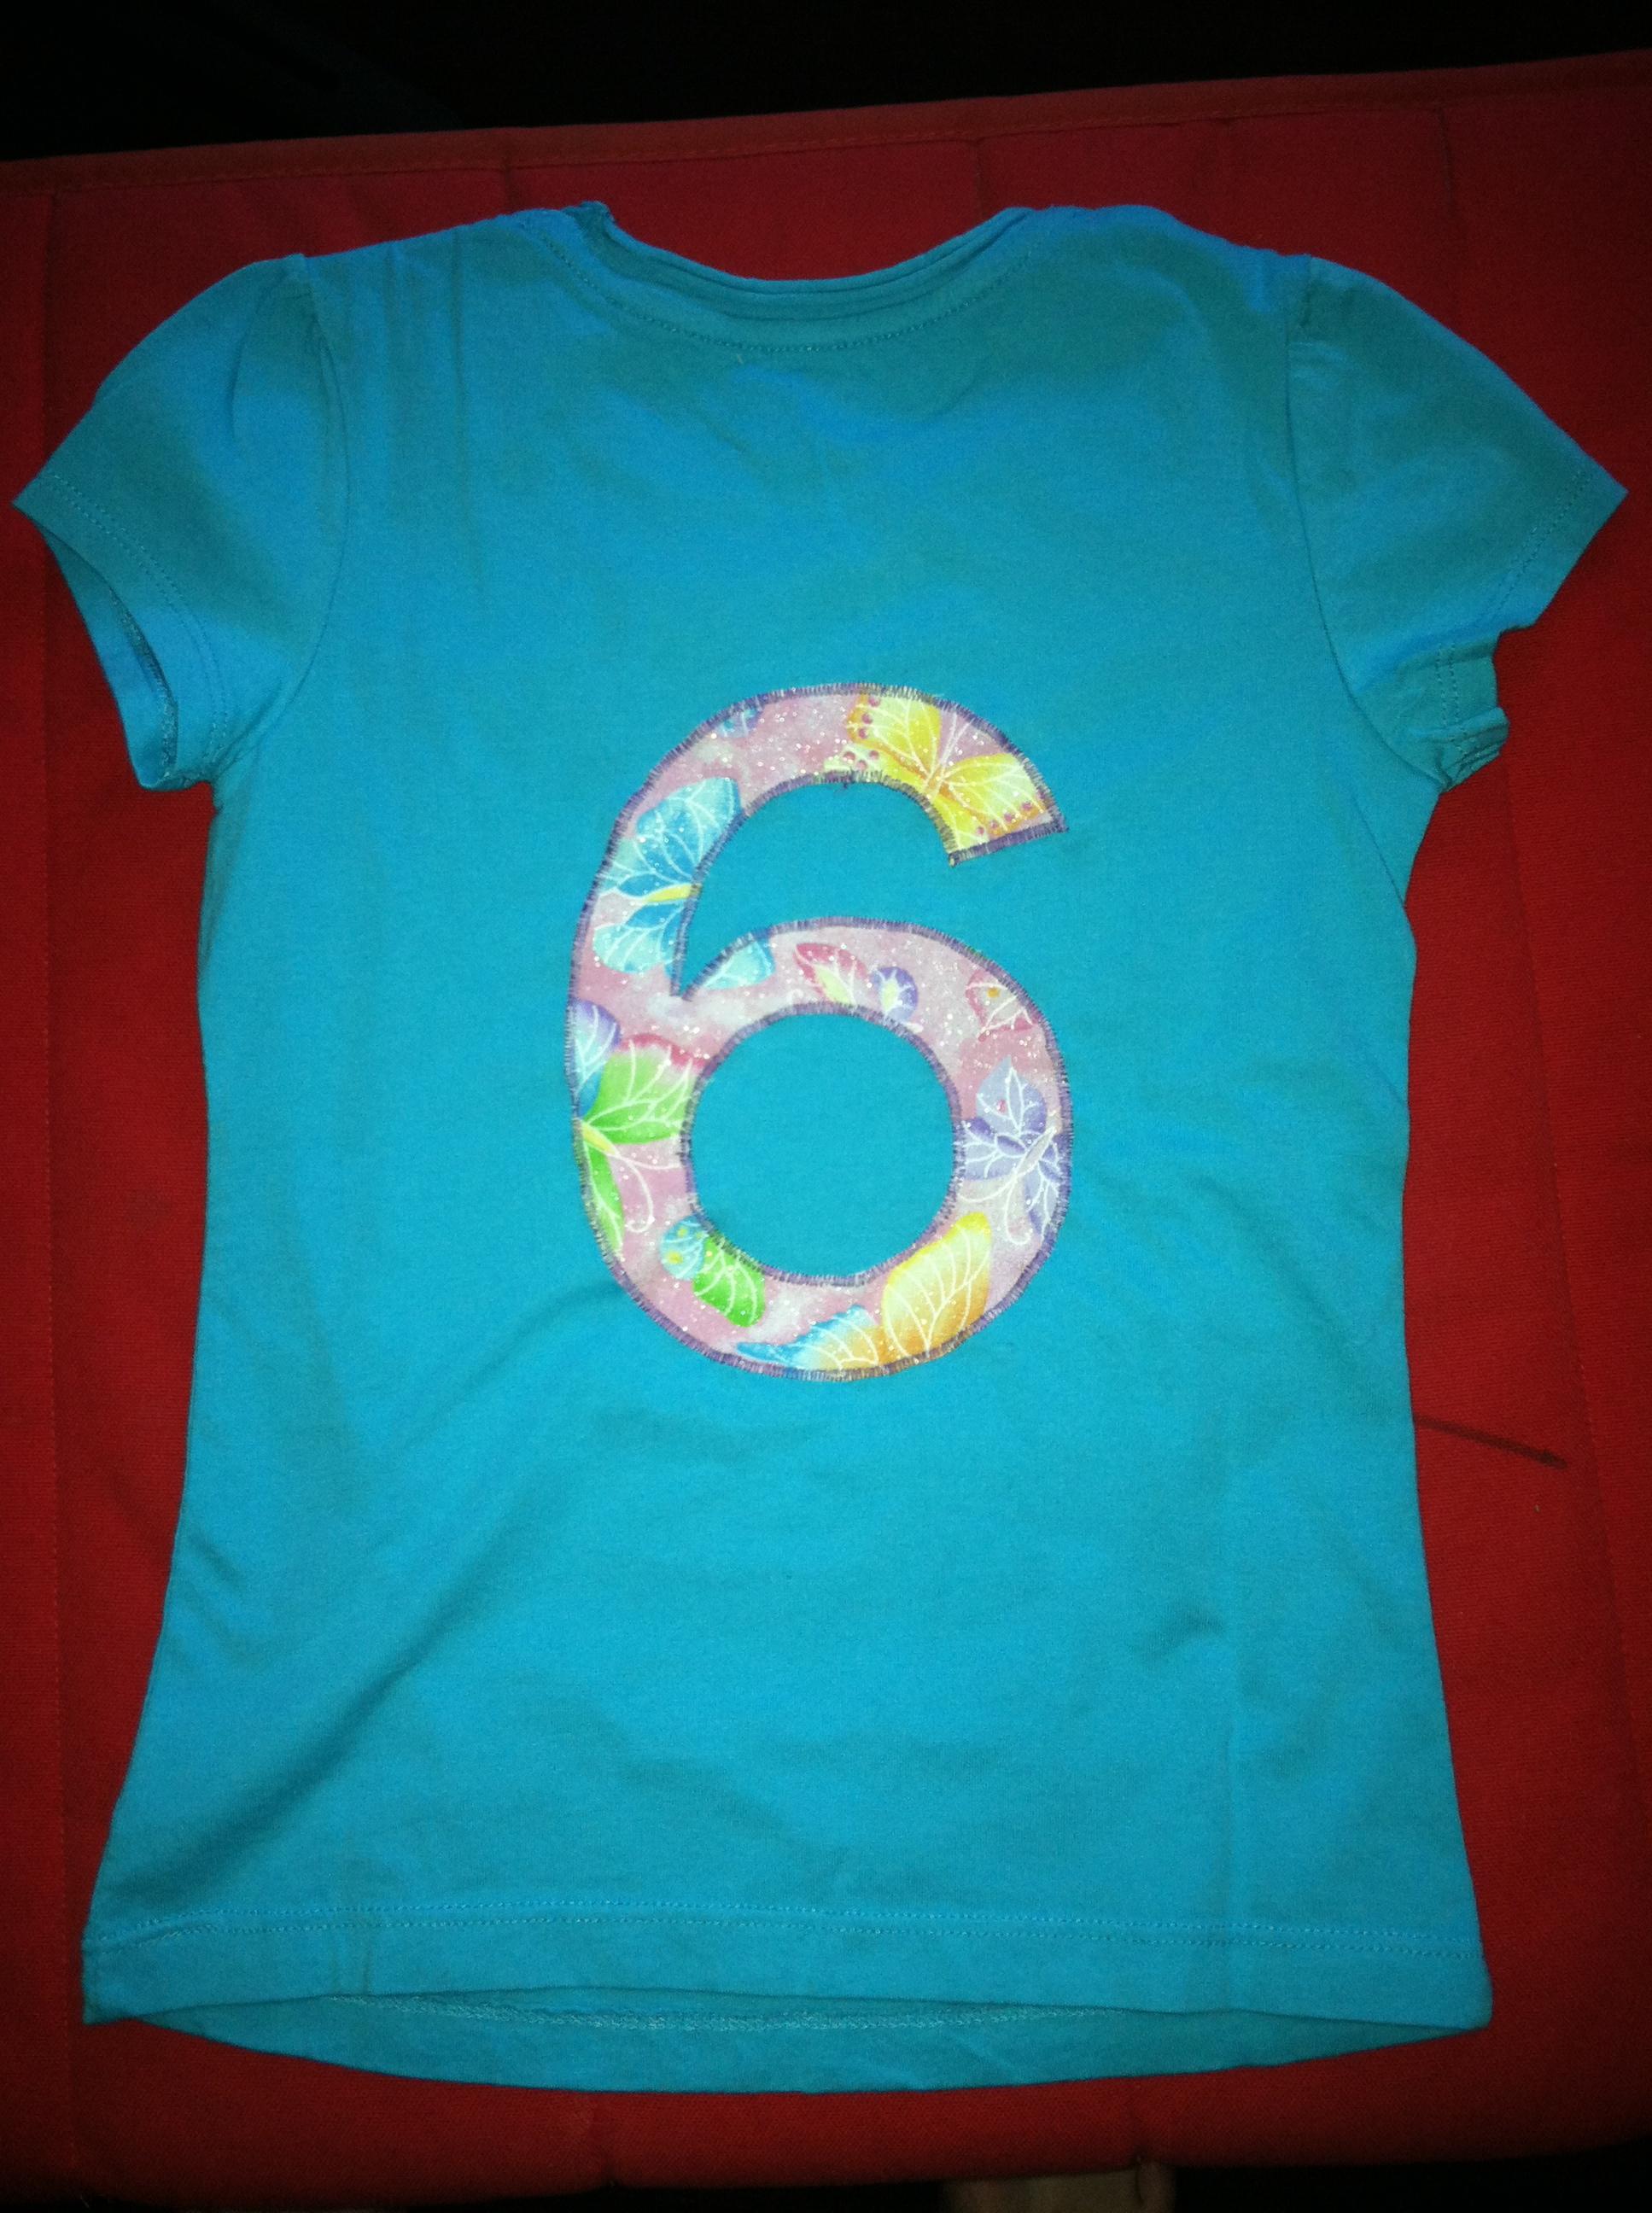 6 Year Old Birthday Shirt Birthdayshirt Girl Front Back